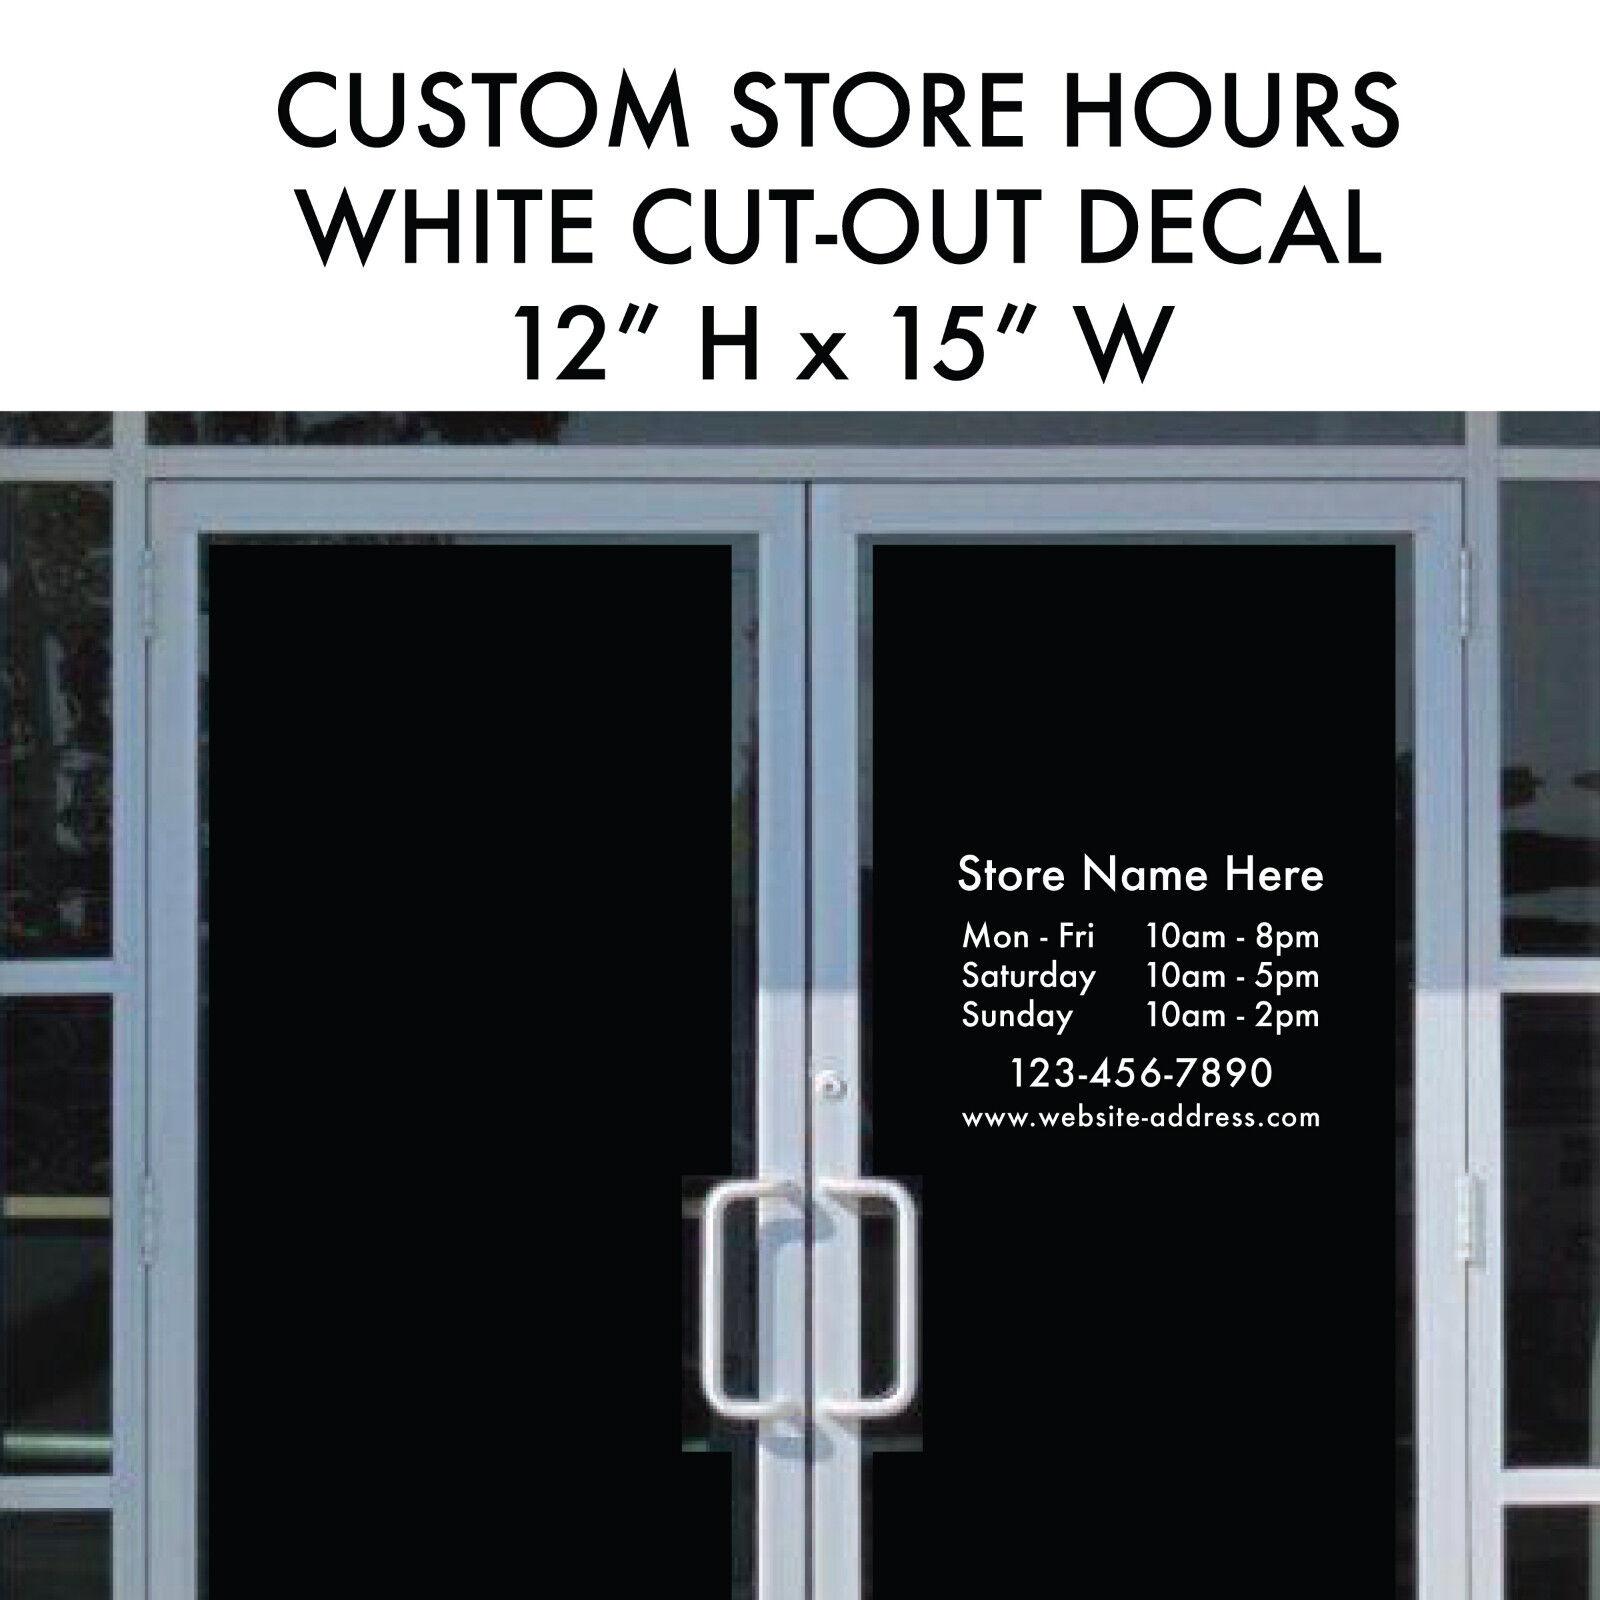 Hours Business Custom Cutout Vinyl Decal Sticker X Window - Custom vinyl decal stickers for business